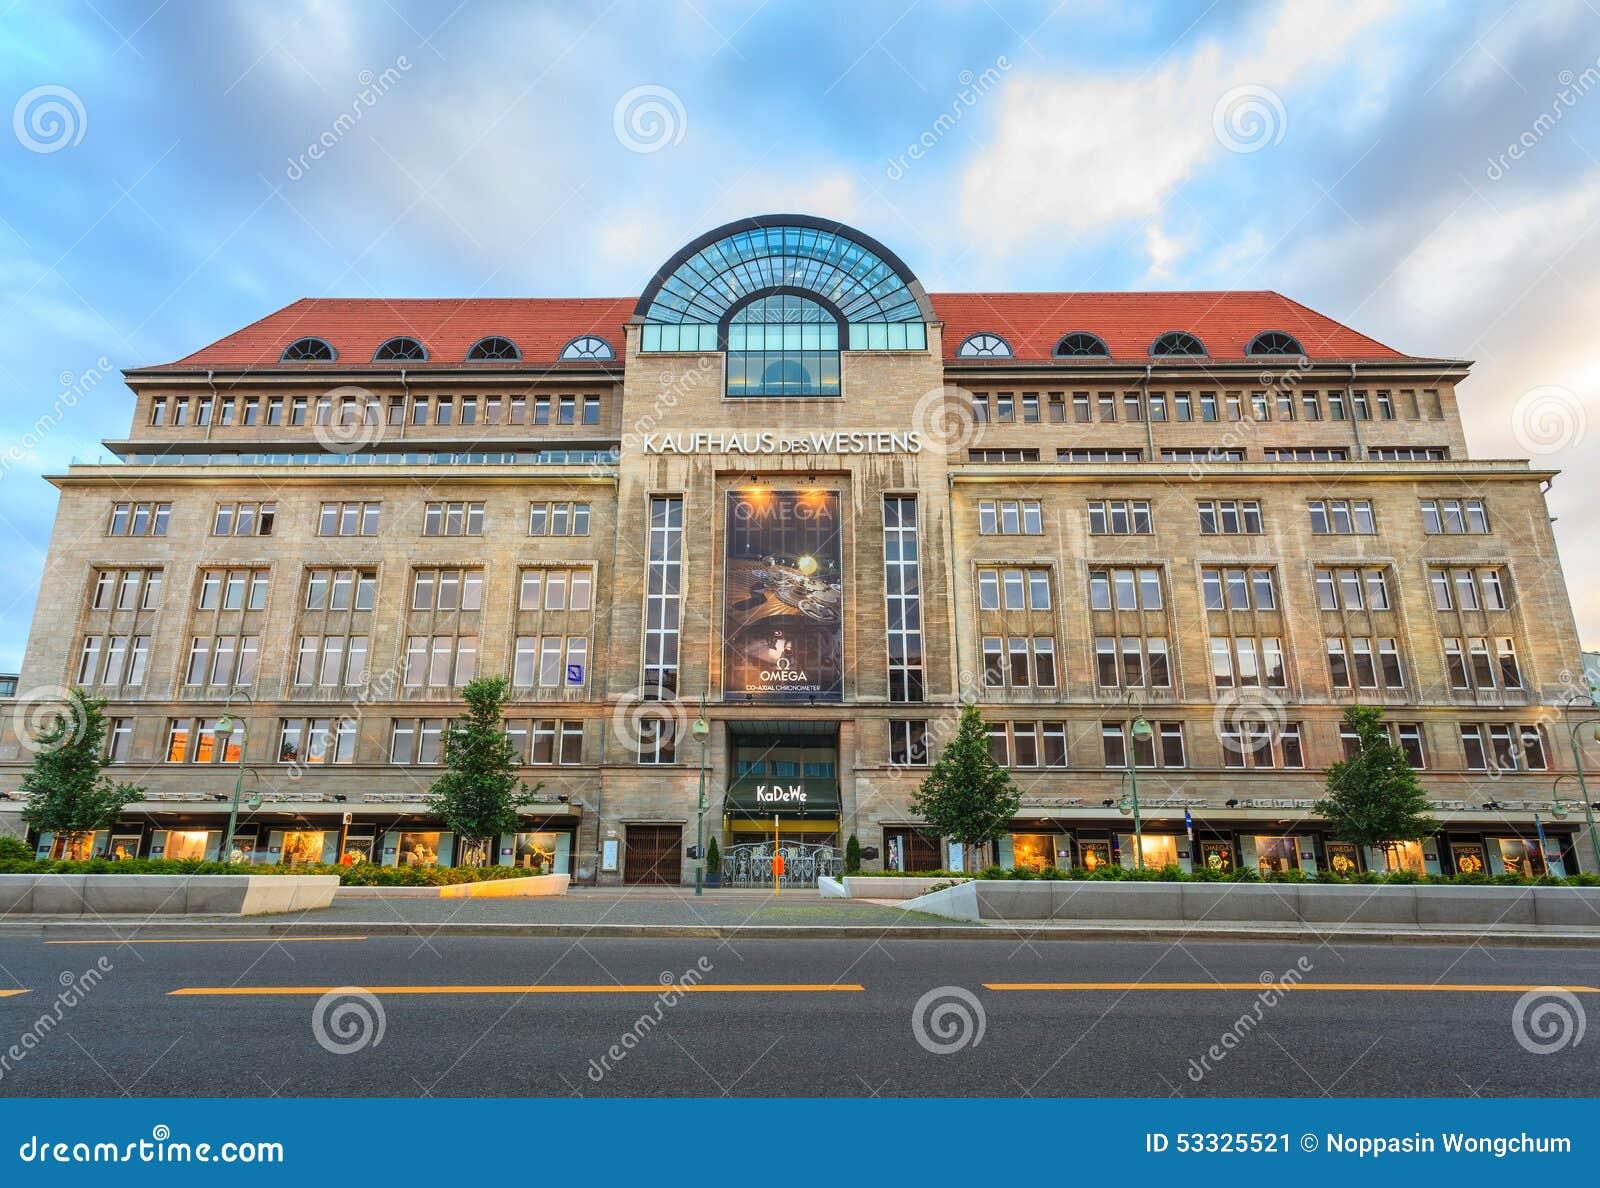 187b6ece339129 Kaufhaus Des Westens Or Kadewe - Berlin - Germany Editorial Photo ...